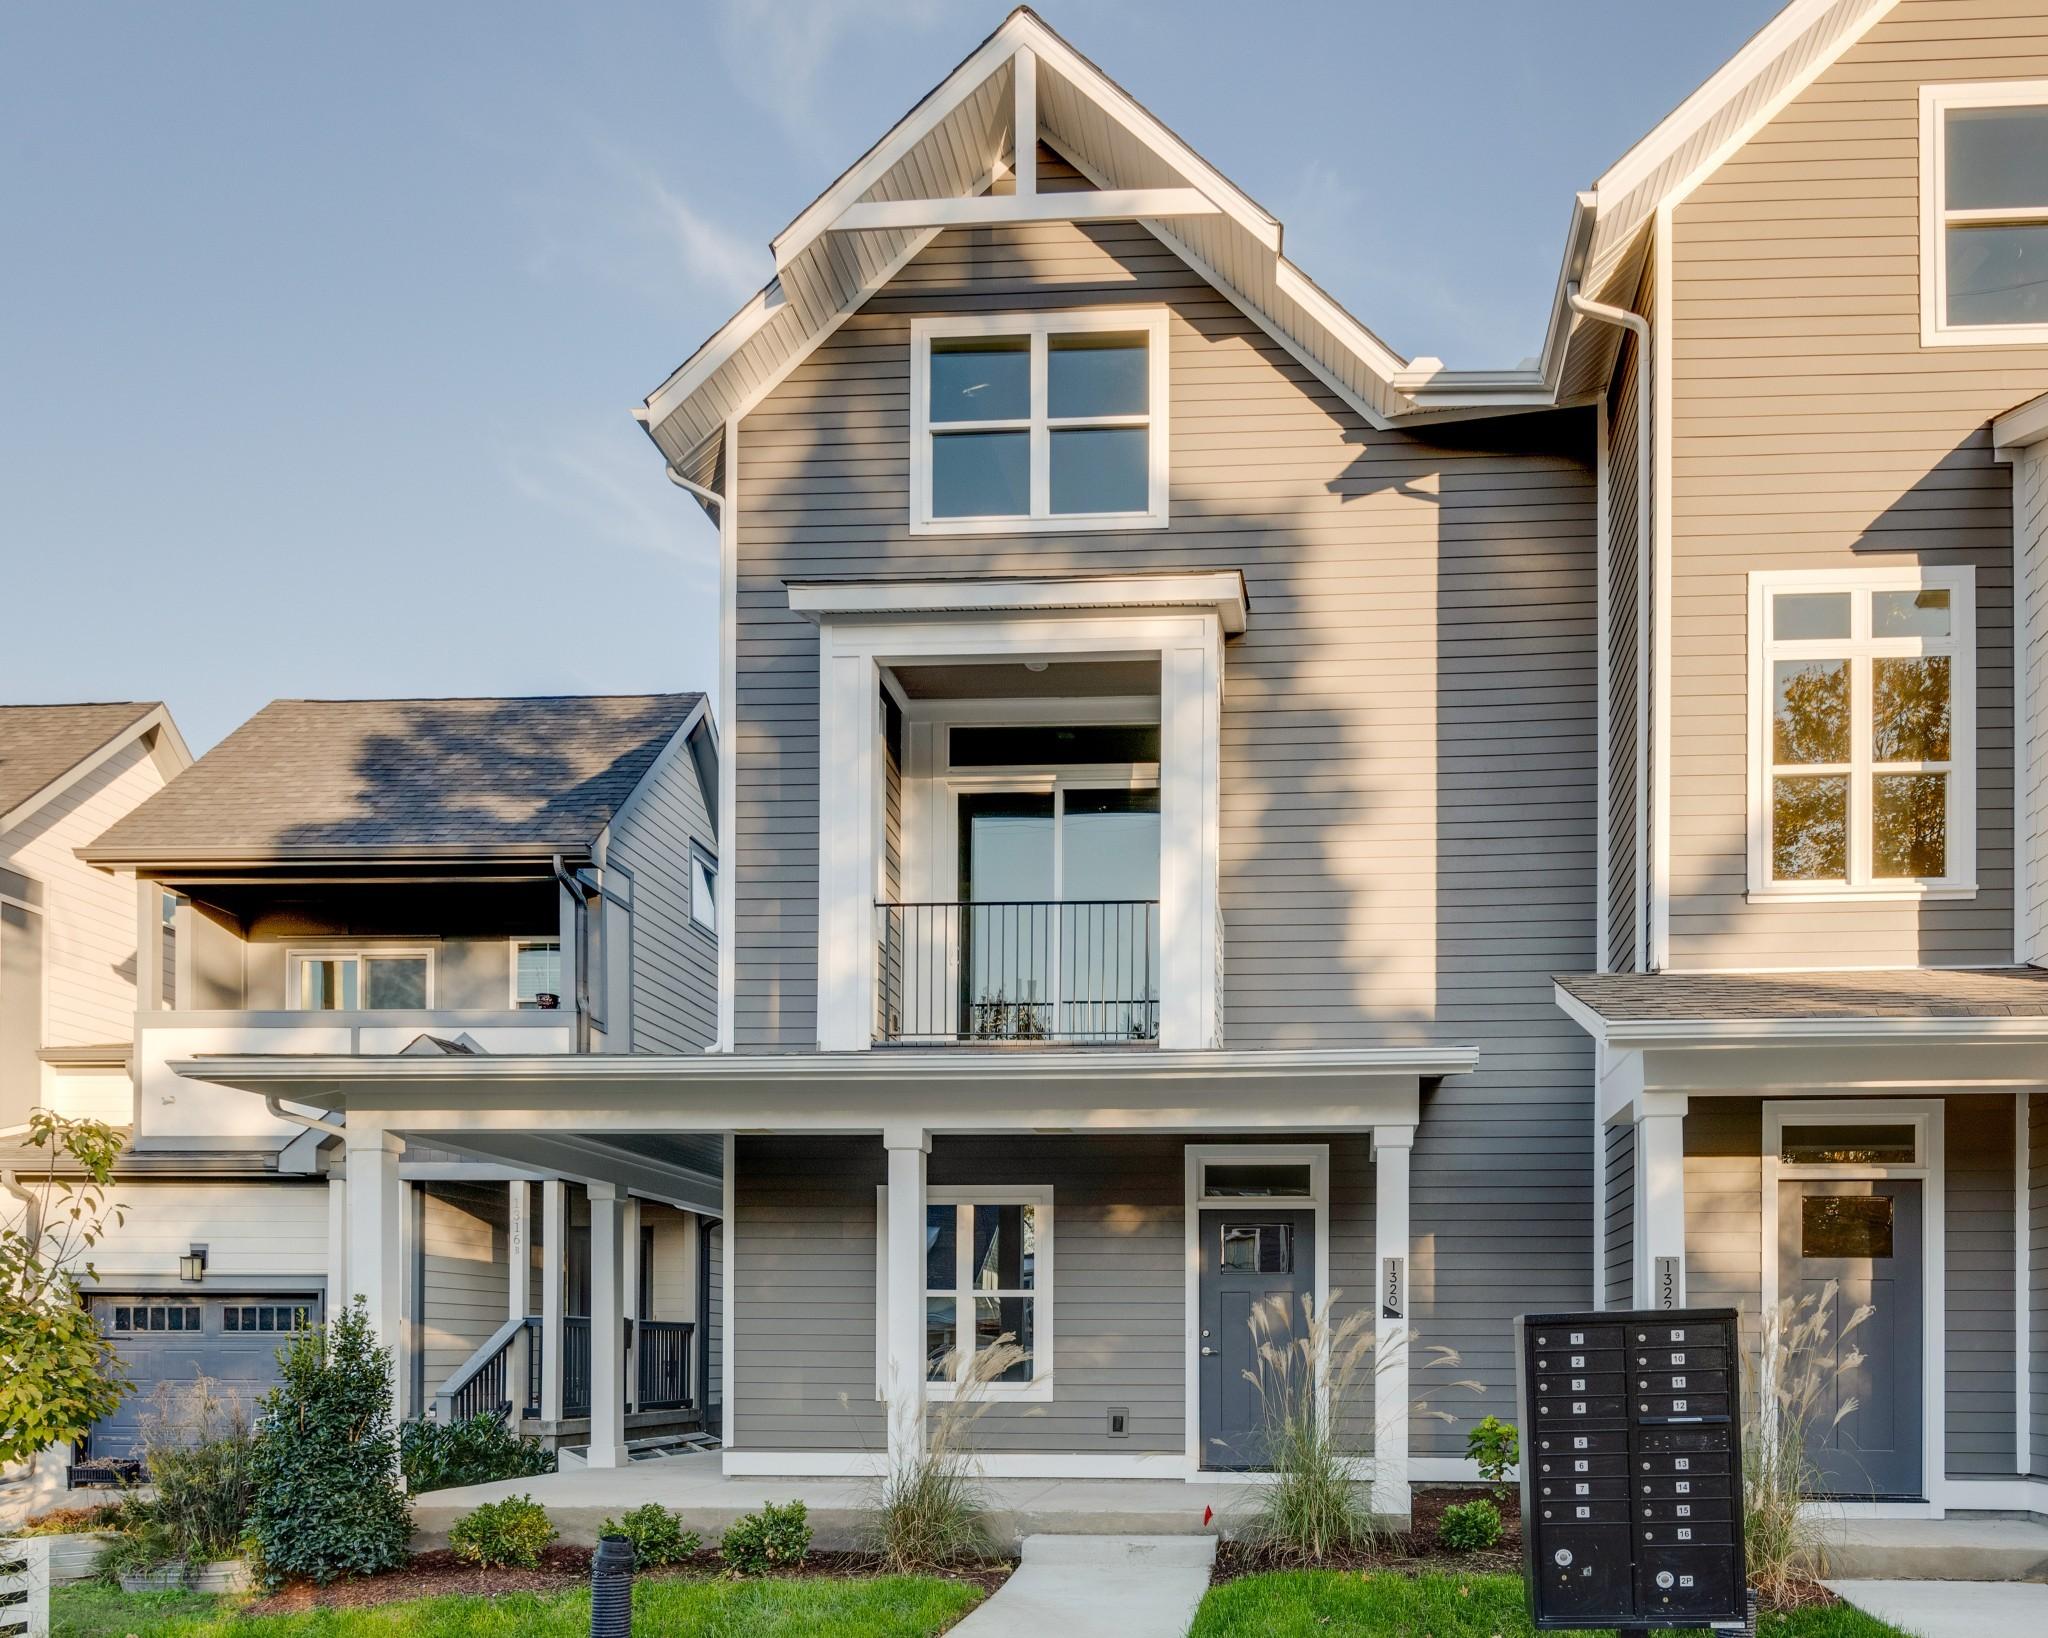 1320 Pillow Street, Nashville, TN 37203 - Nashville, TN real estate listing